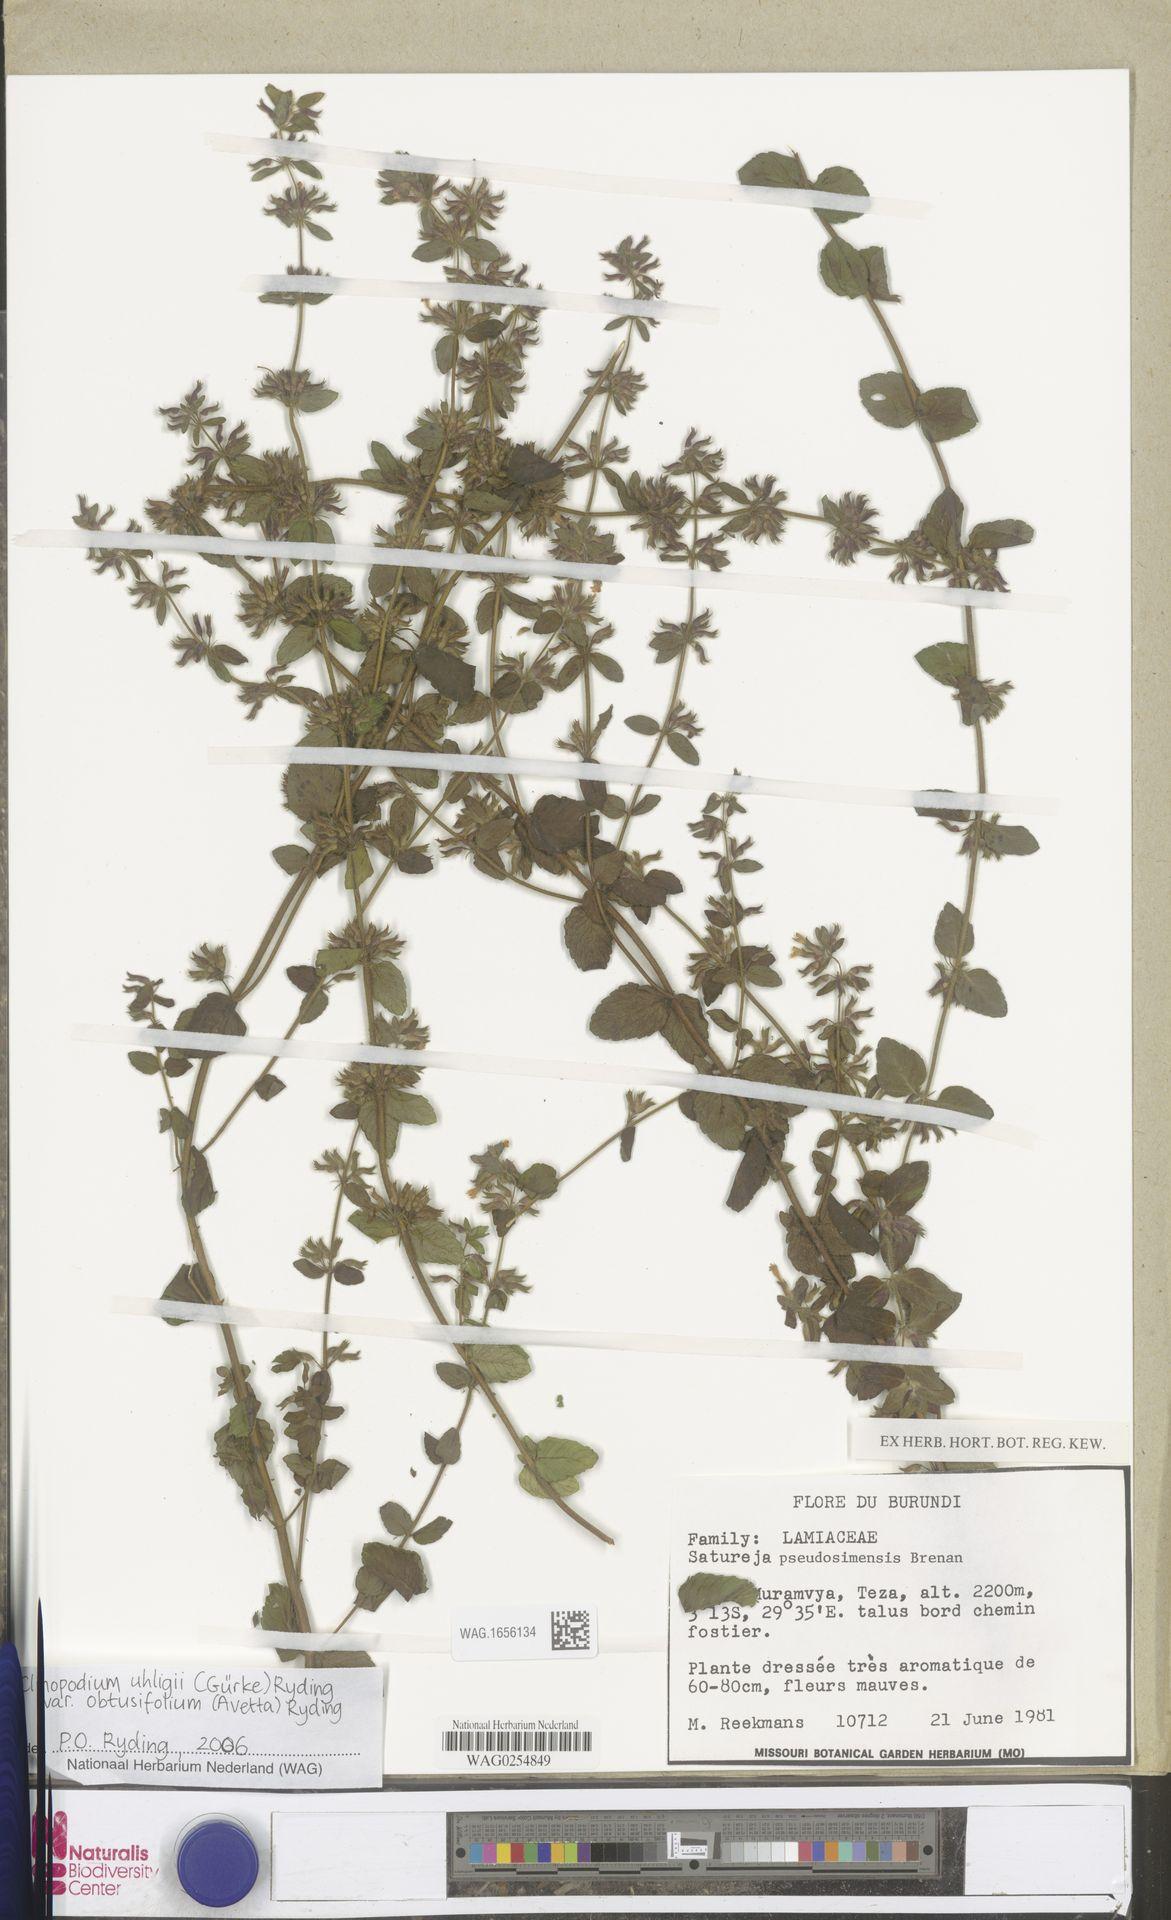 WAG.1656134 | Clinopodium uhligii var. obtusifolium (Avetta) Ryding